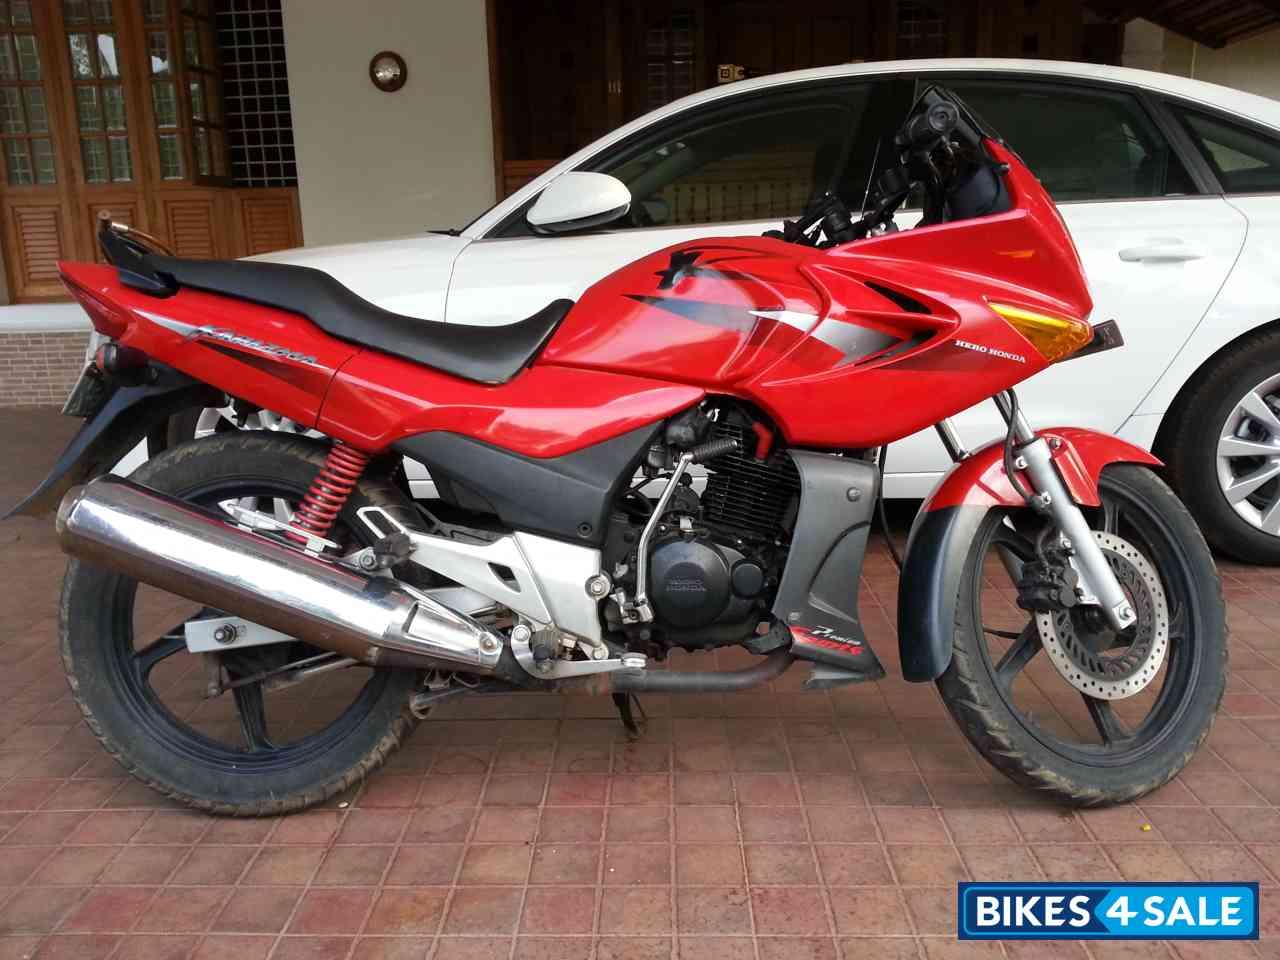 hero motocorp karizma zmr march 2015 price ahmedabad 2016 car release date. Black Bedroom Furniture Sets. Home Design Ideas